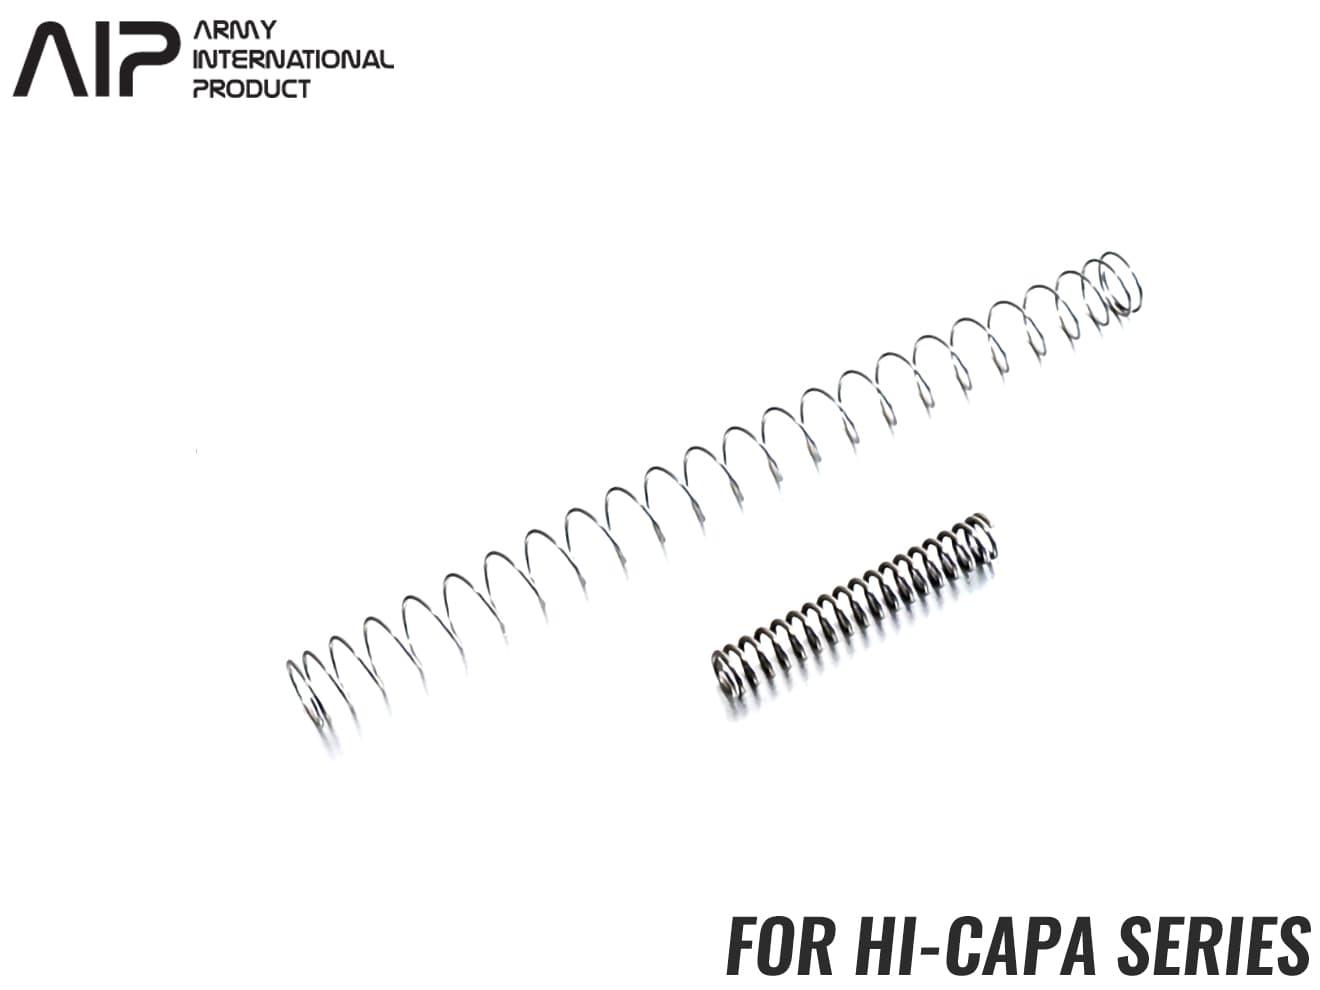 AIP 100% 強化リコイルスプリング/ハンマースプリング Hi-CAPA◆東京マルイ GBB ハイキャパ 4.3/5.1シリーズ用 ヘタリ対策 純正同等レート